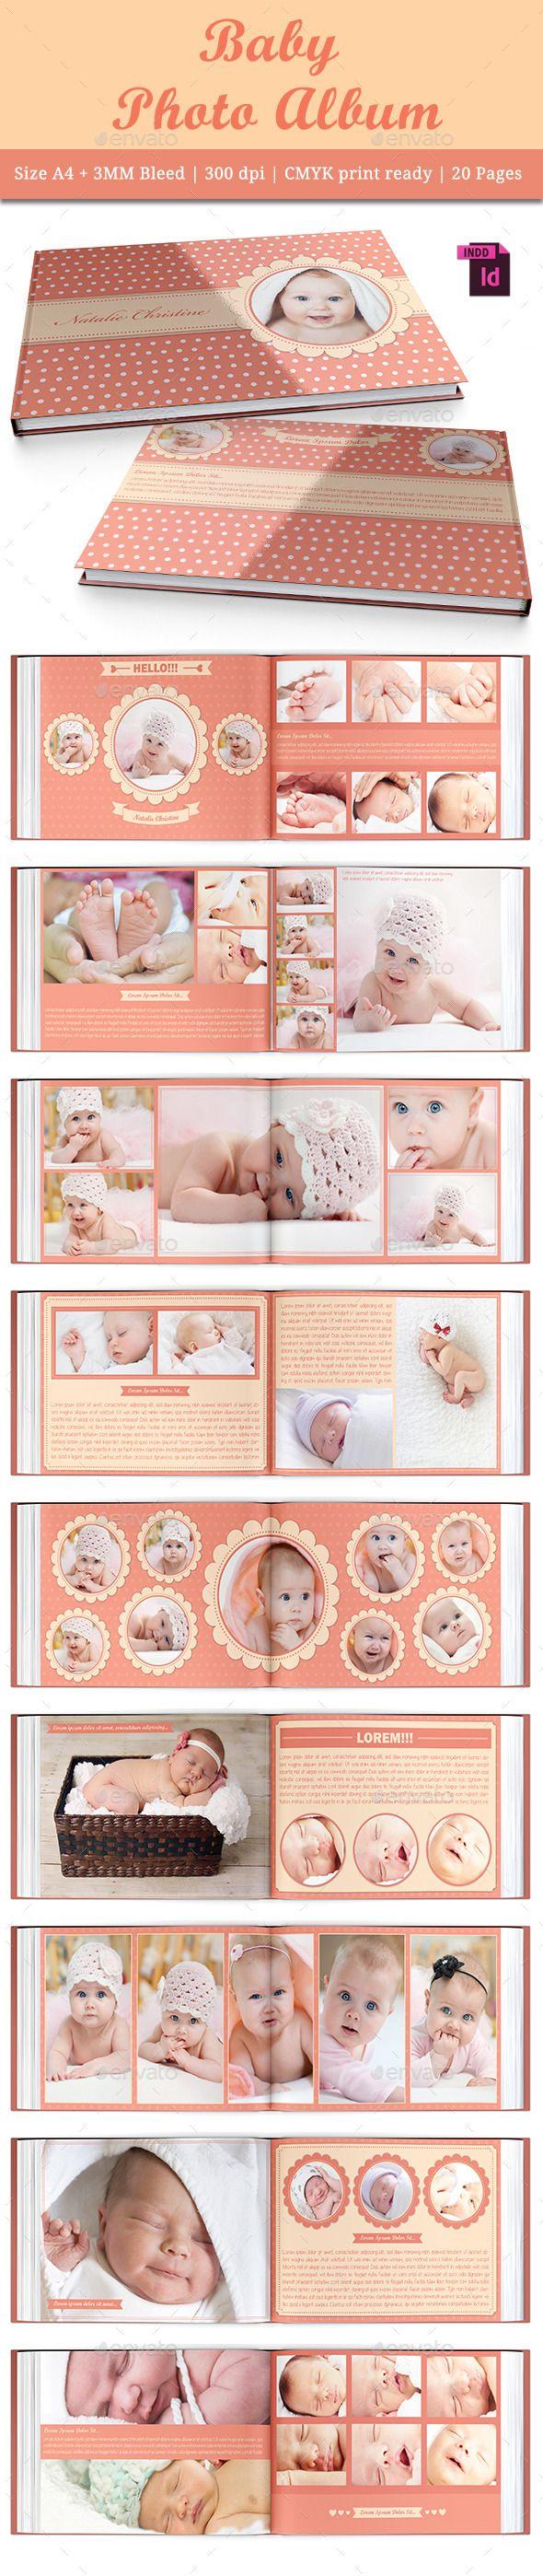 Baby Photo Album - Photo Albums Print Templates